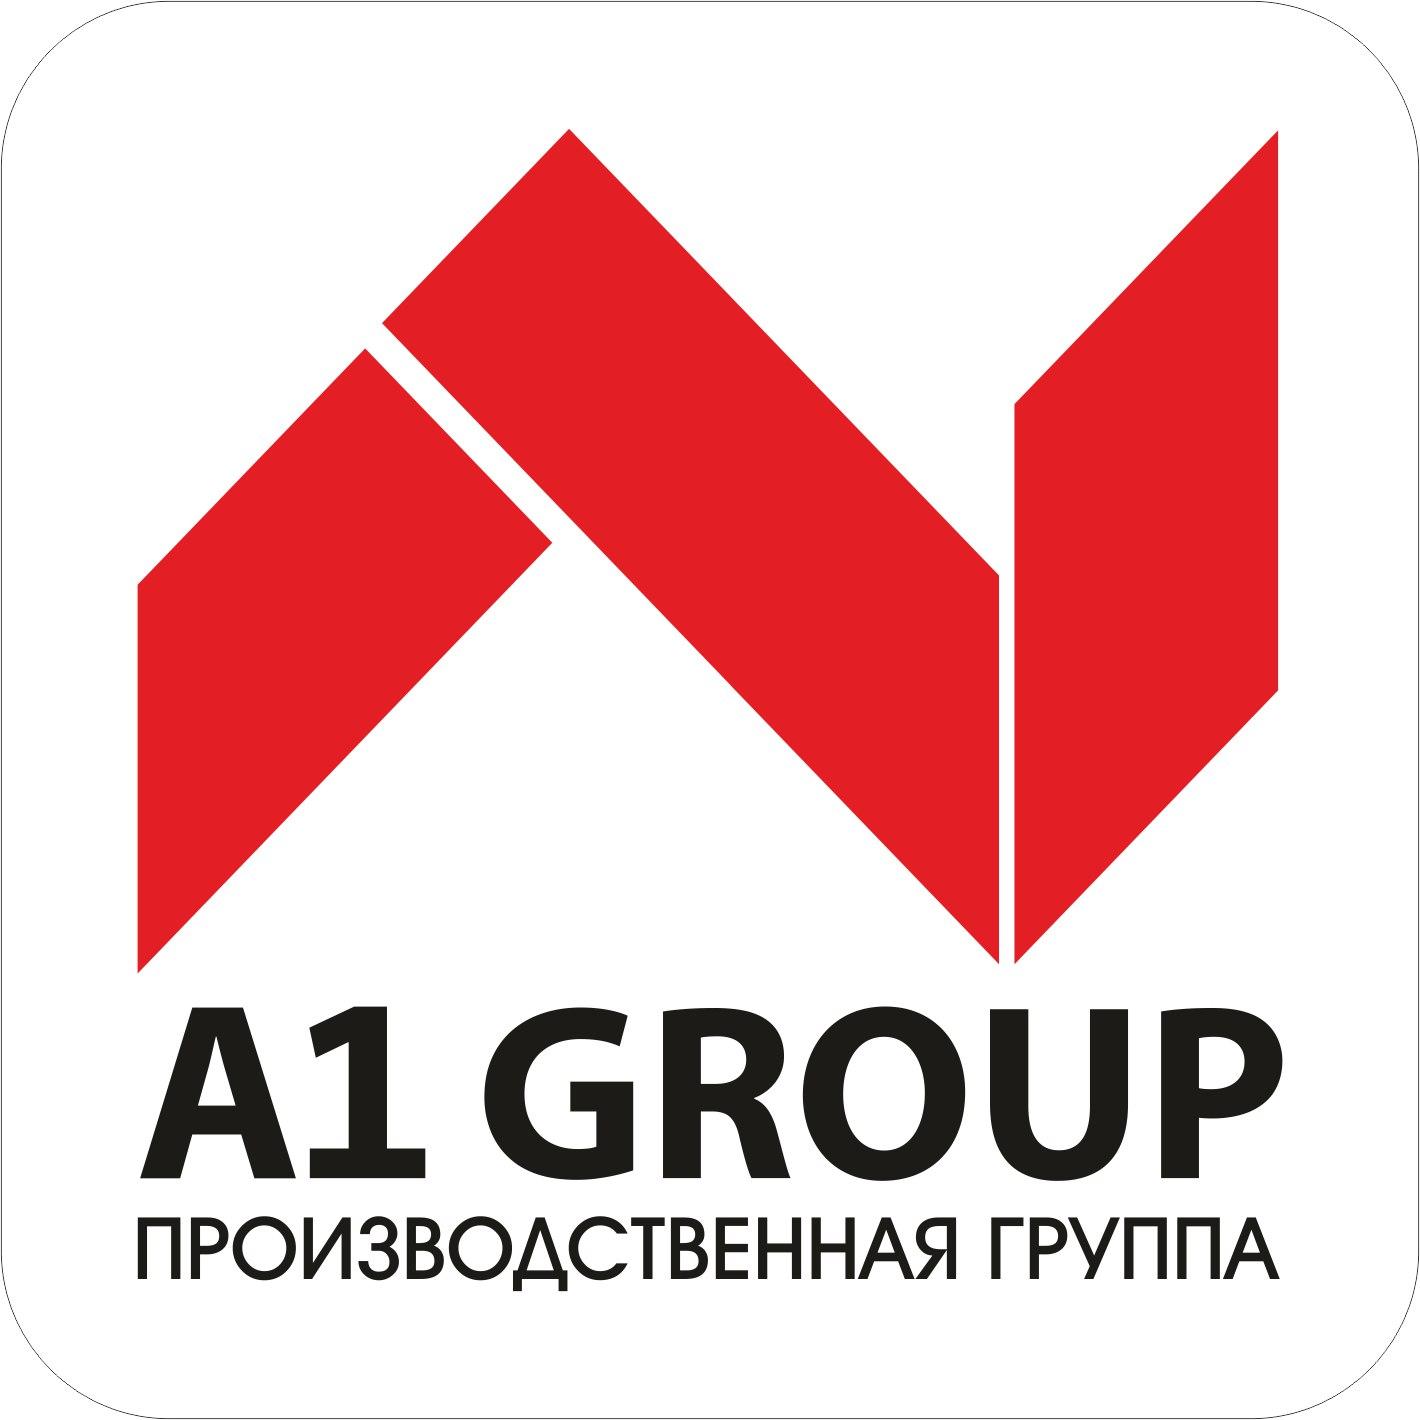 A1 Group